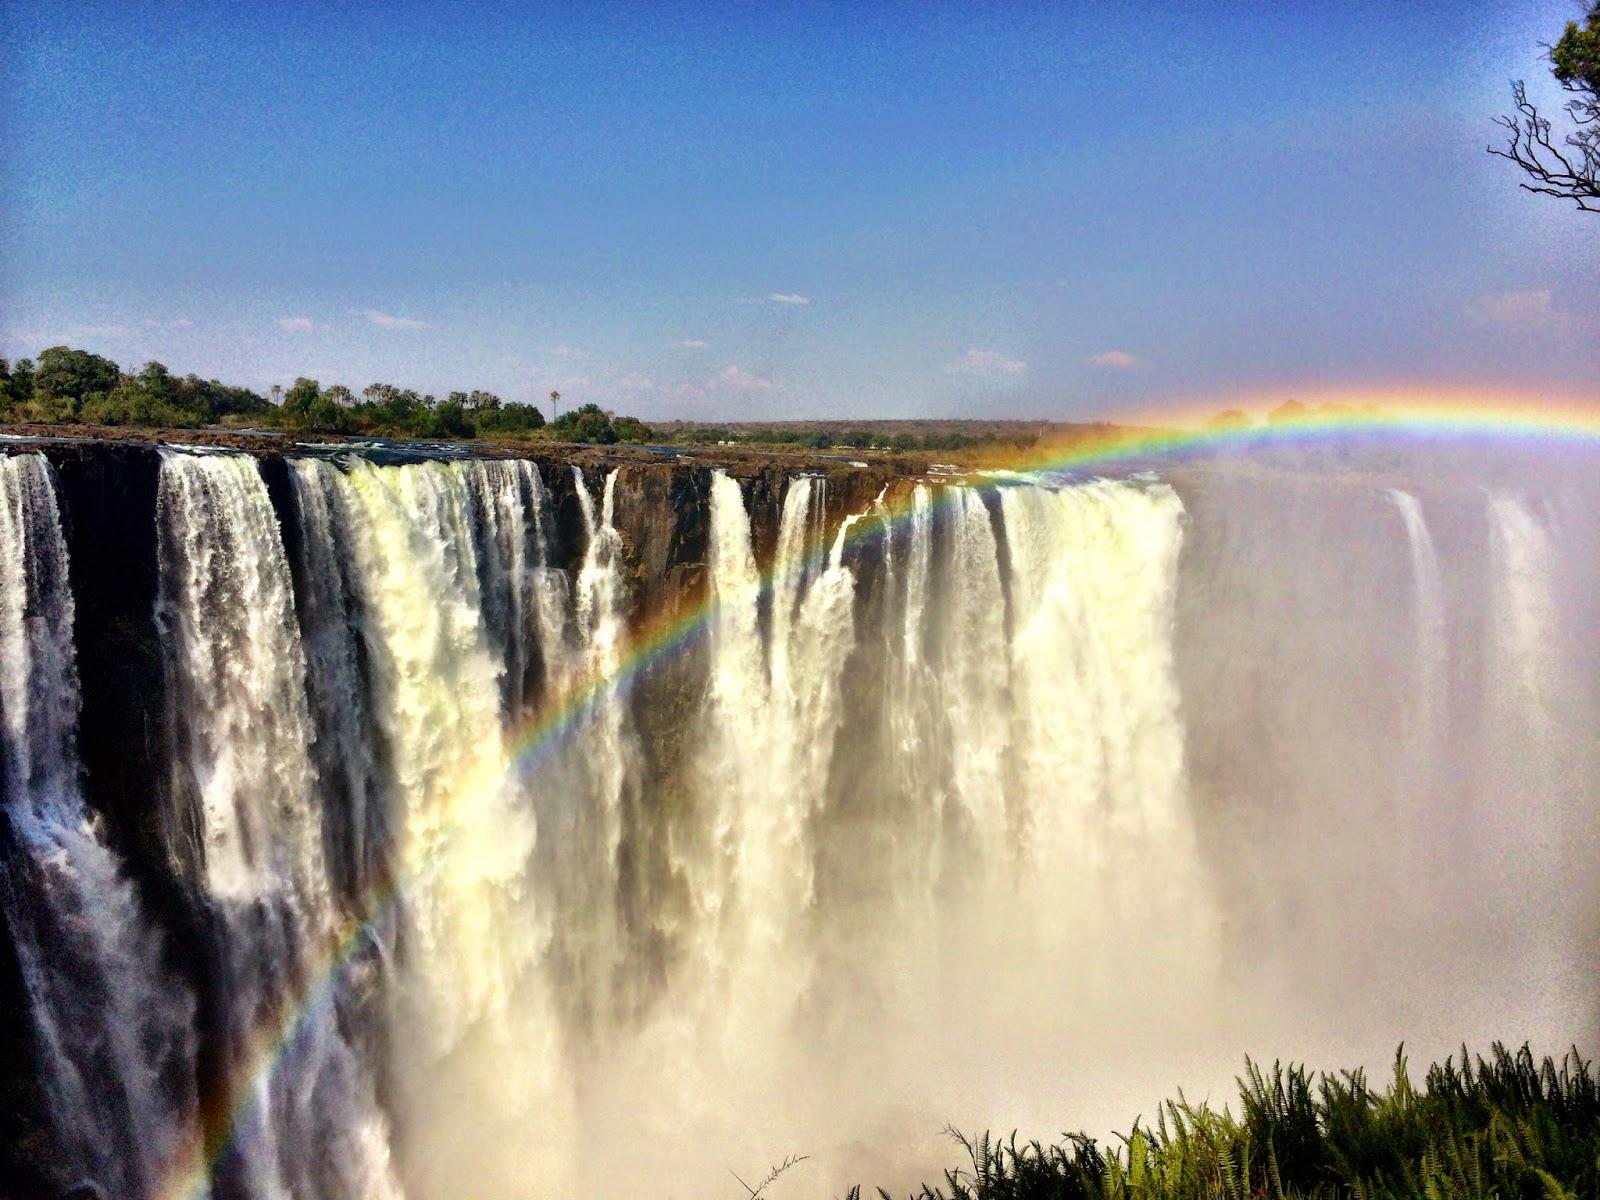 A rainbow over Victoria Falls, Zimbabwe (October 2014)